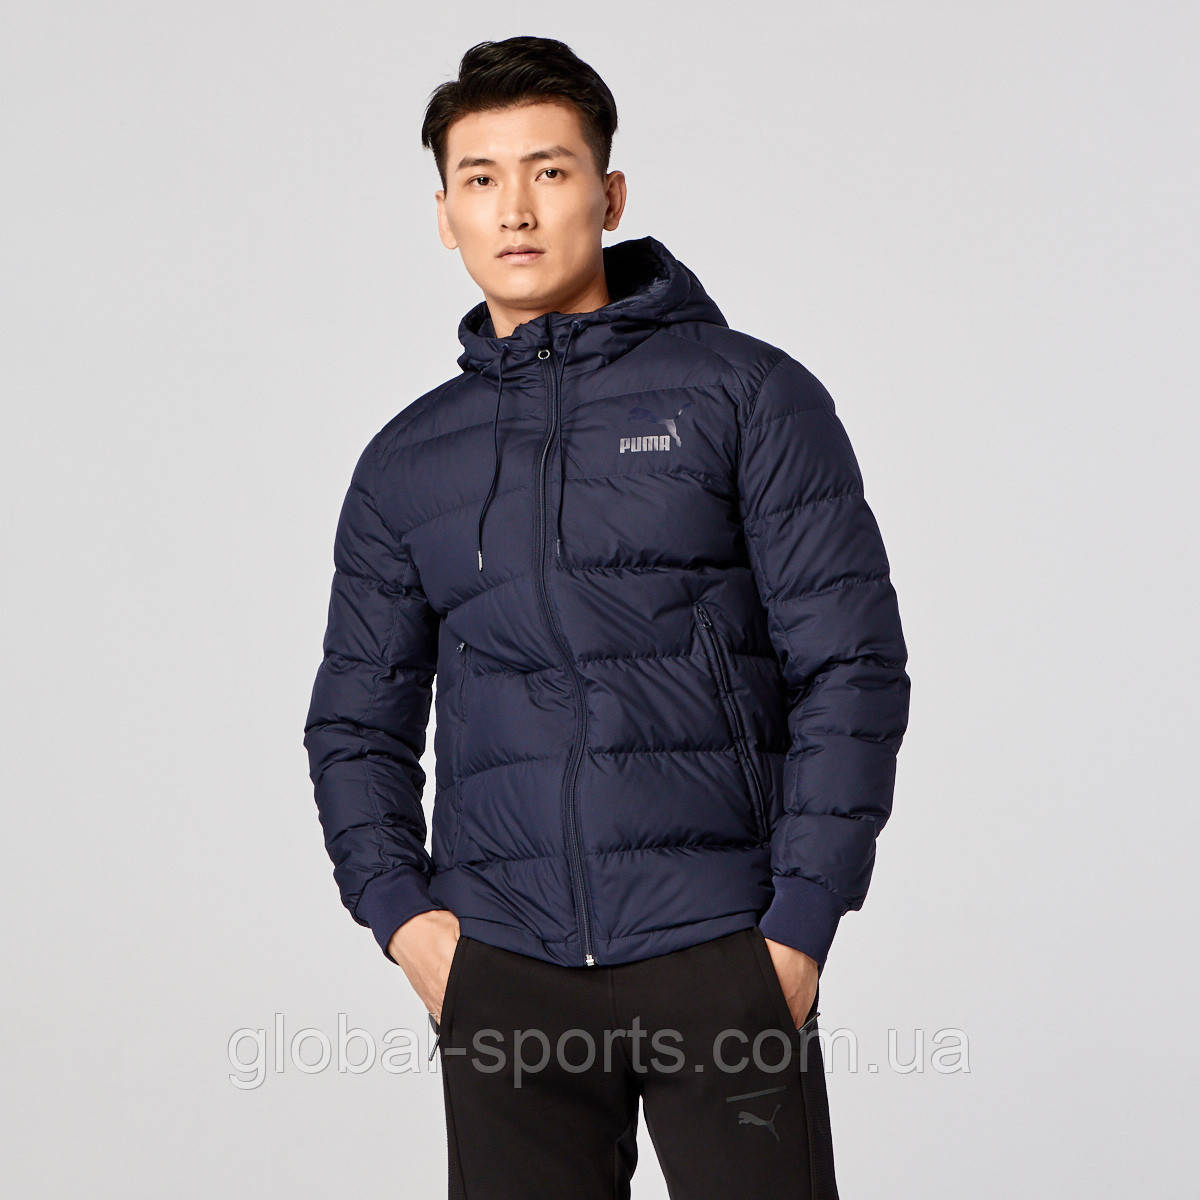 Мужская куртка Puma (Артикул:57769706)